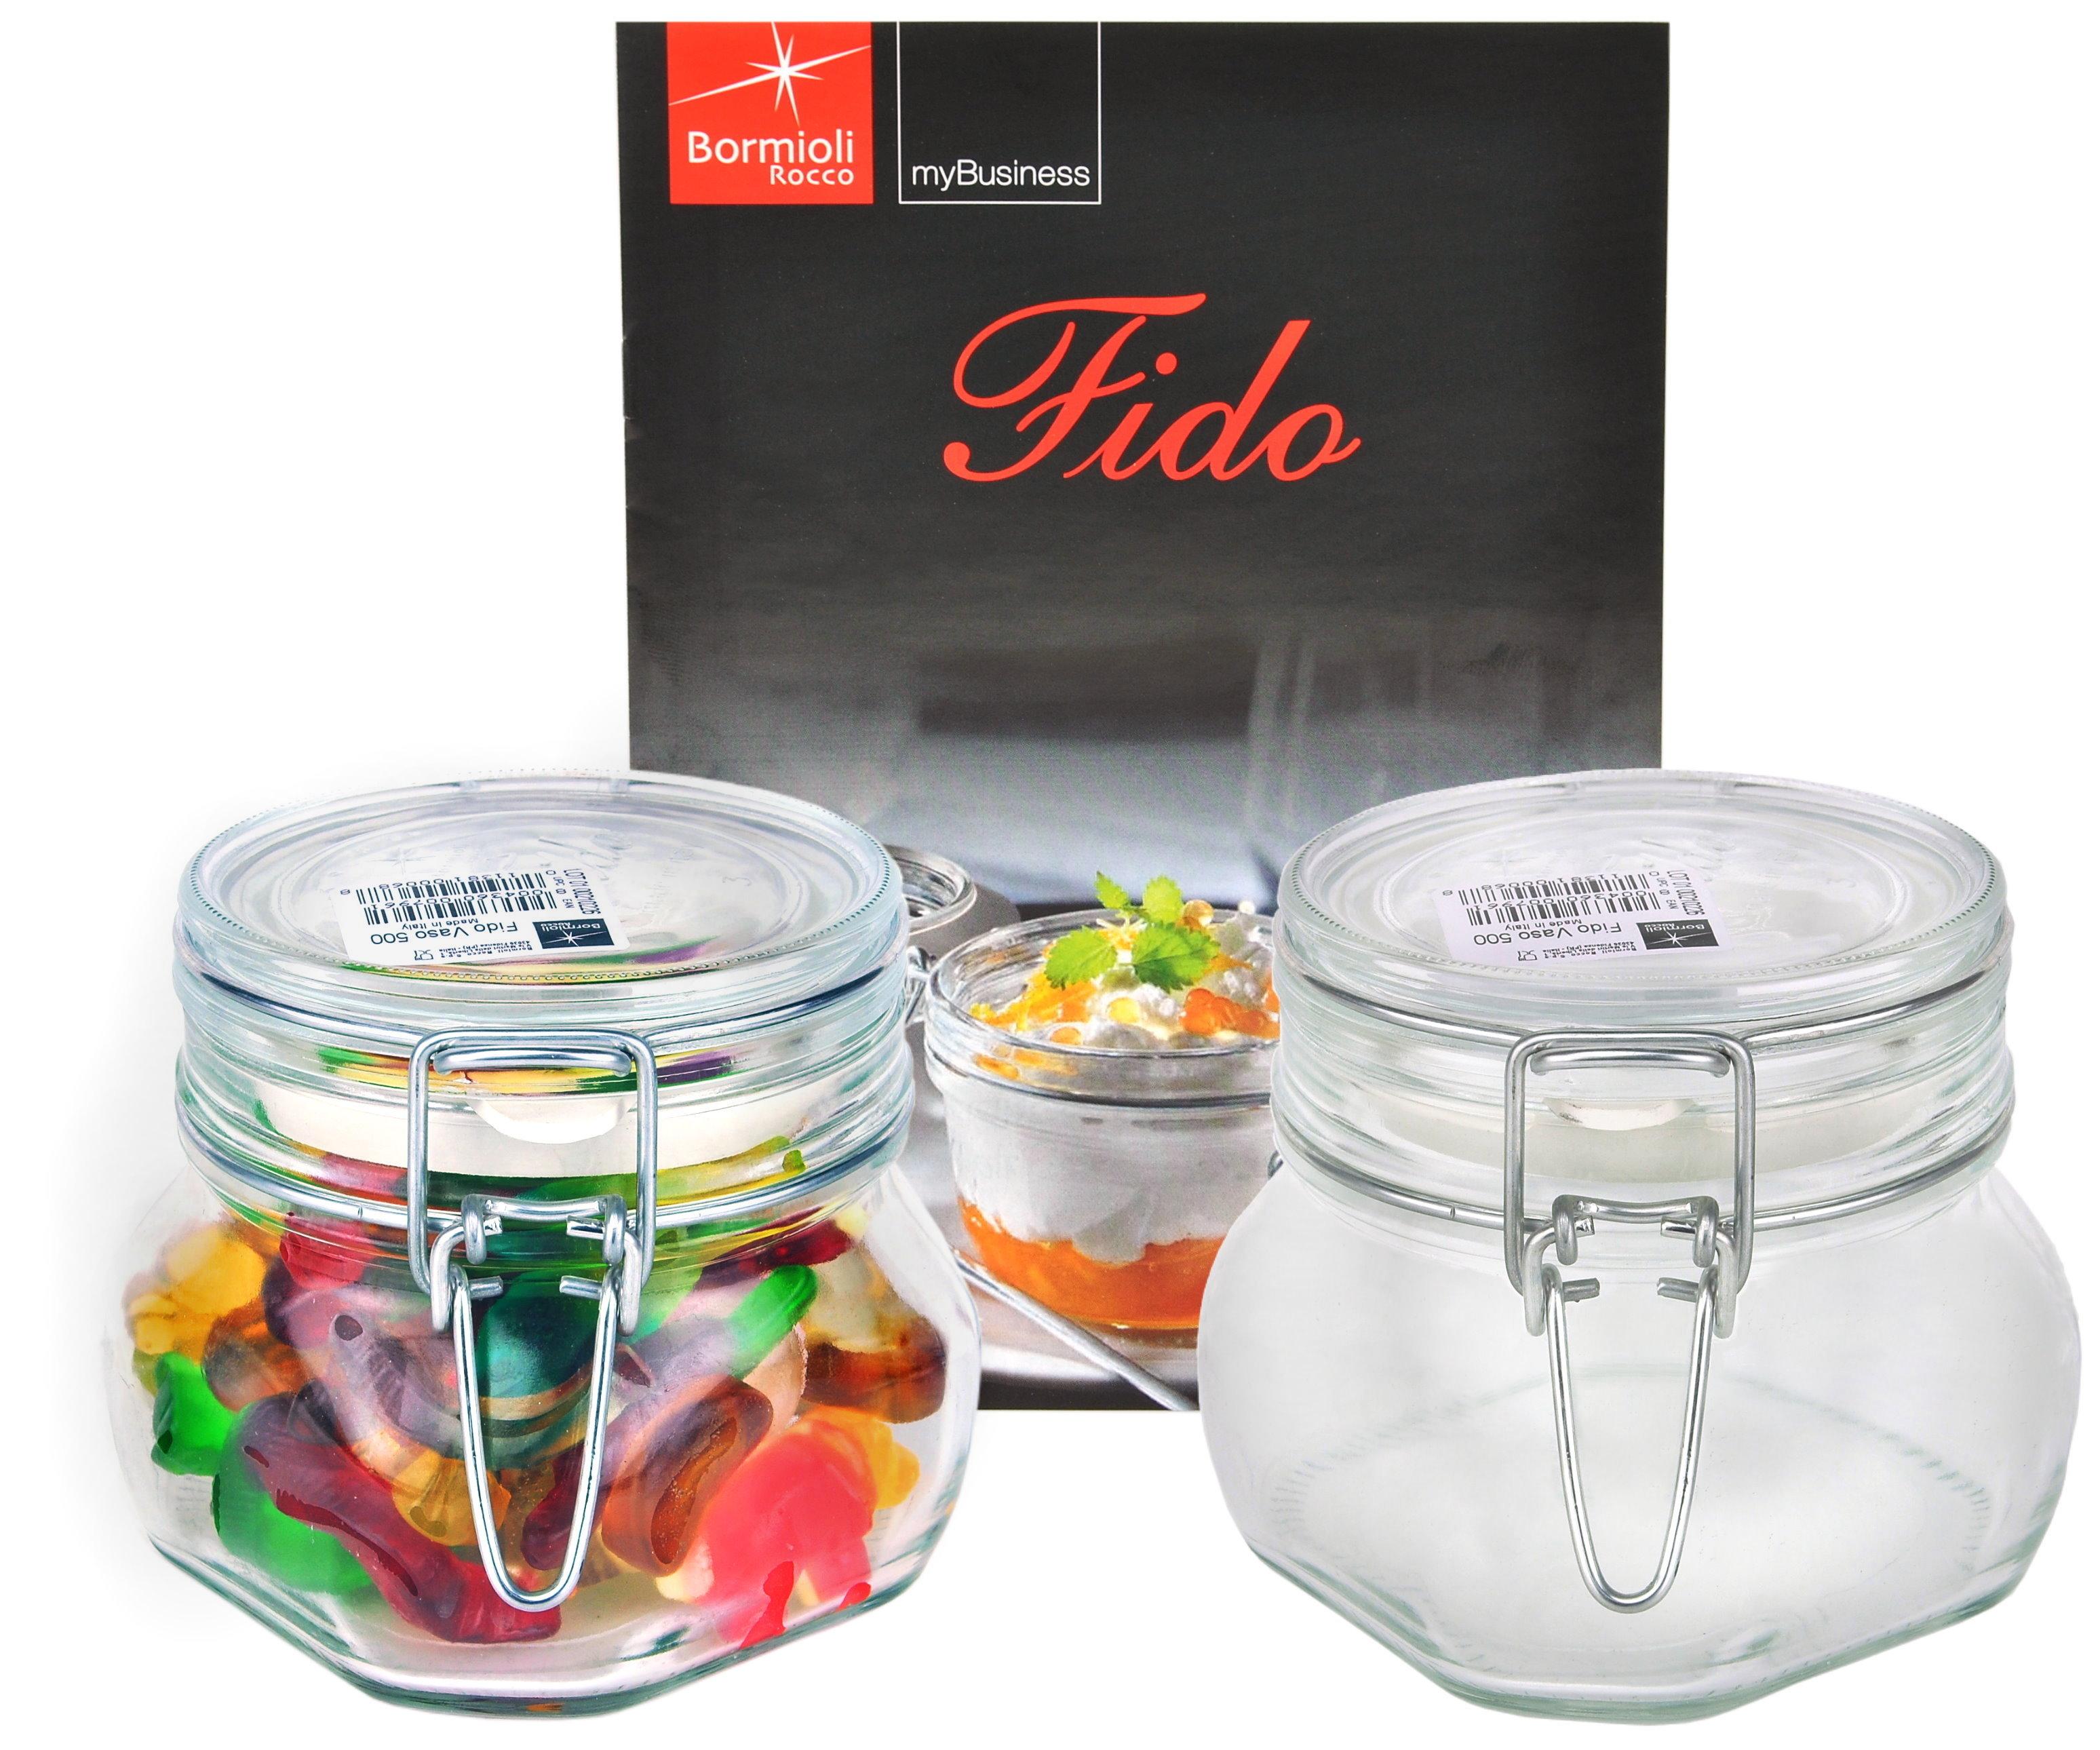 2er set einmachglas eimachgl ser fido 0 5l 500ml vorratsglas rezeptheft ebay. Black Bedroom Furniture Sets. Home Design Ideas